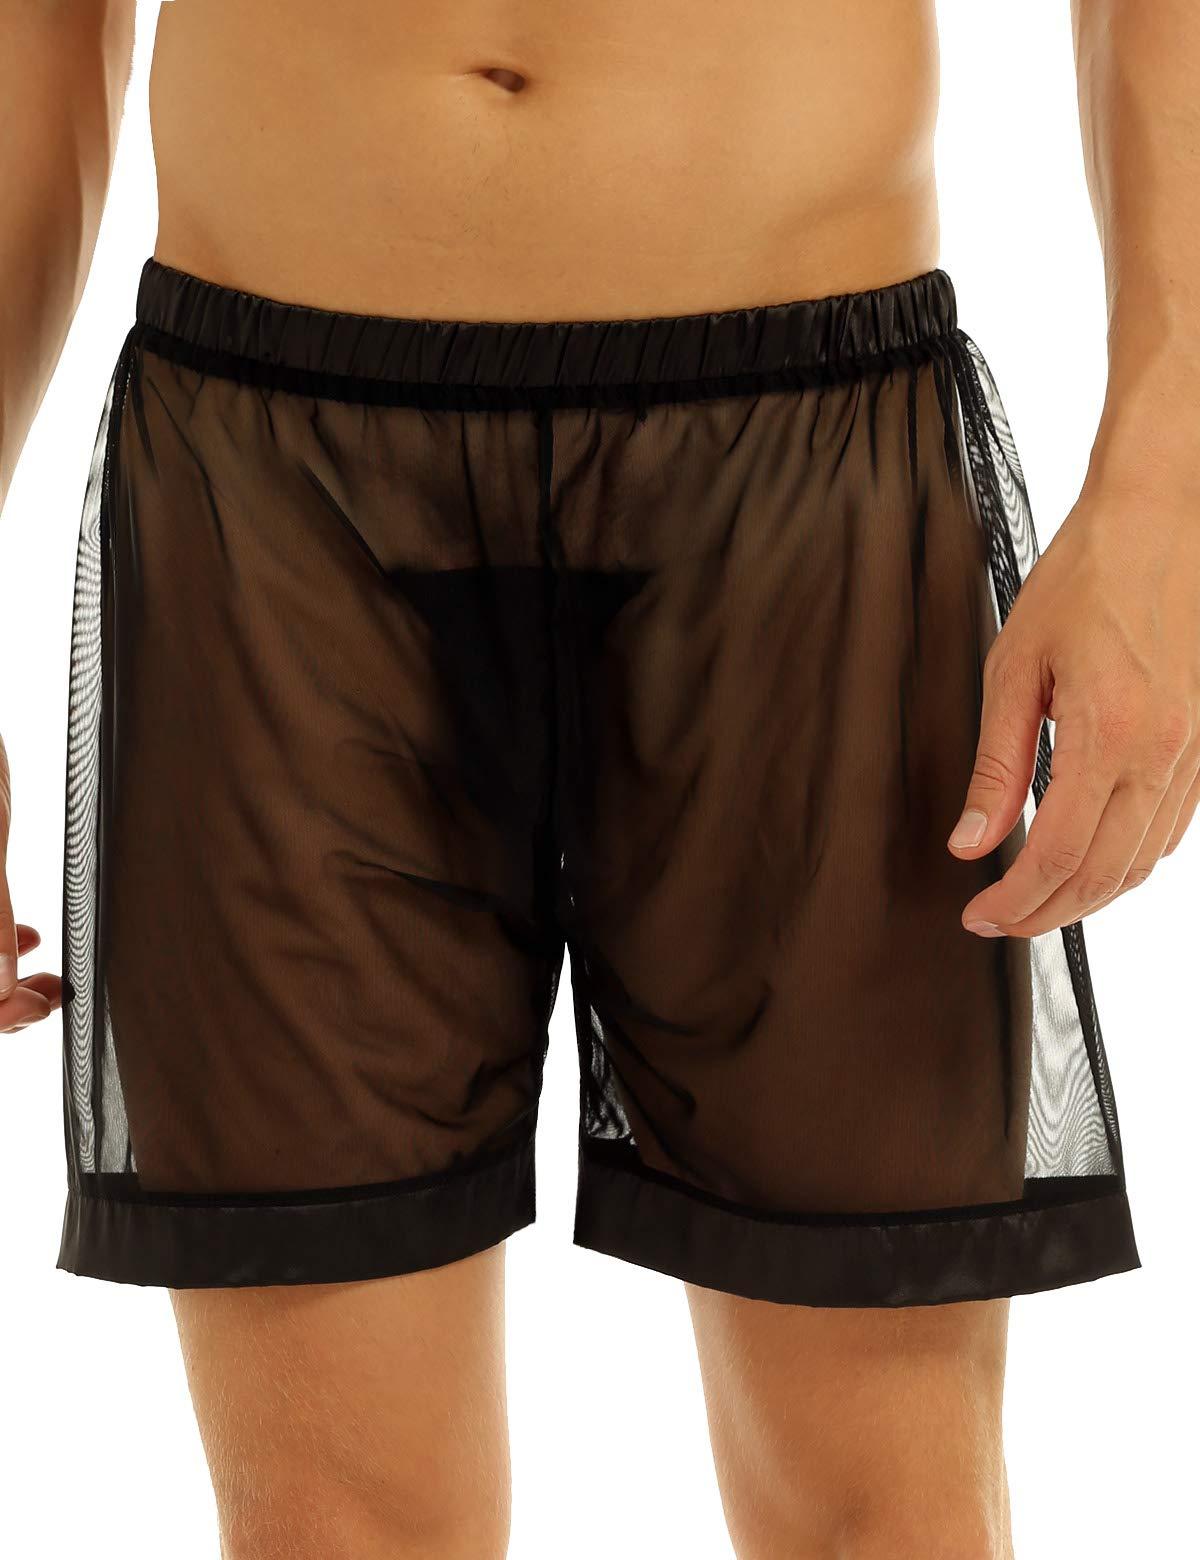 FEESHOW Men's See-Through Mesh Loose Shorts